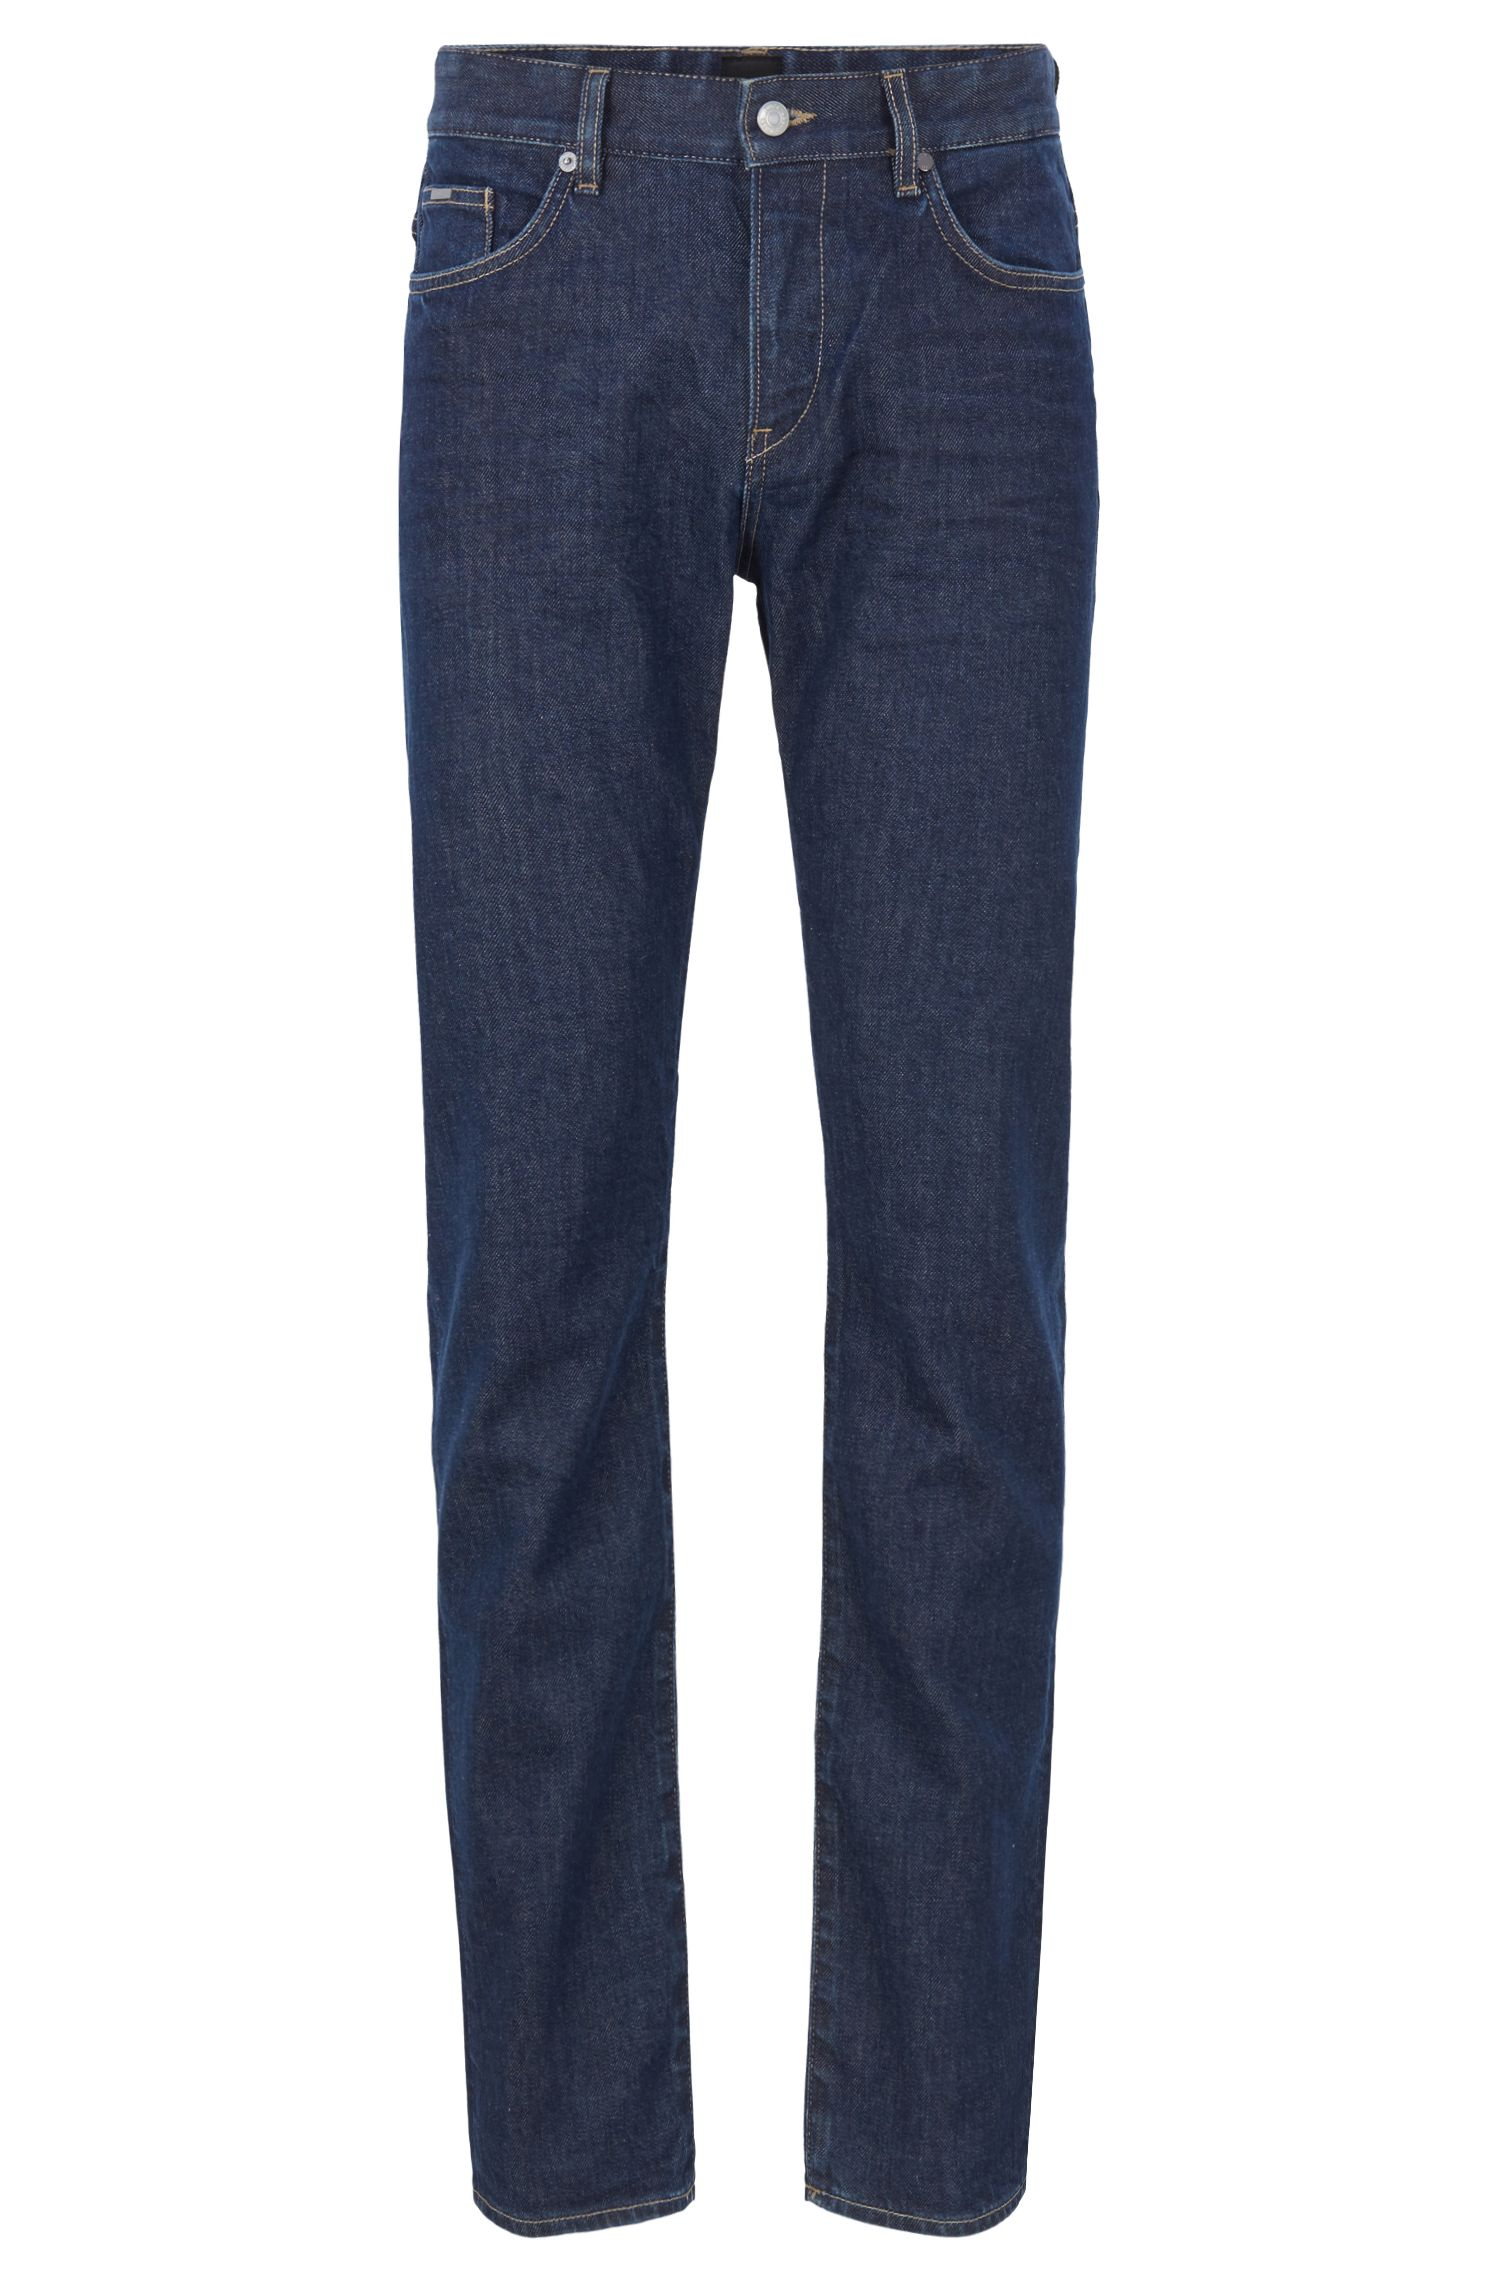 Slim-fit jeans in Italian stretch denim, Dark Blue